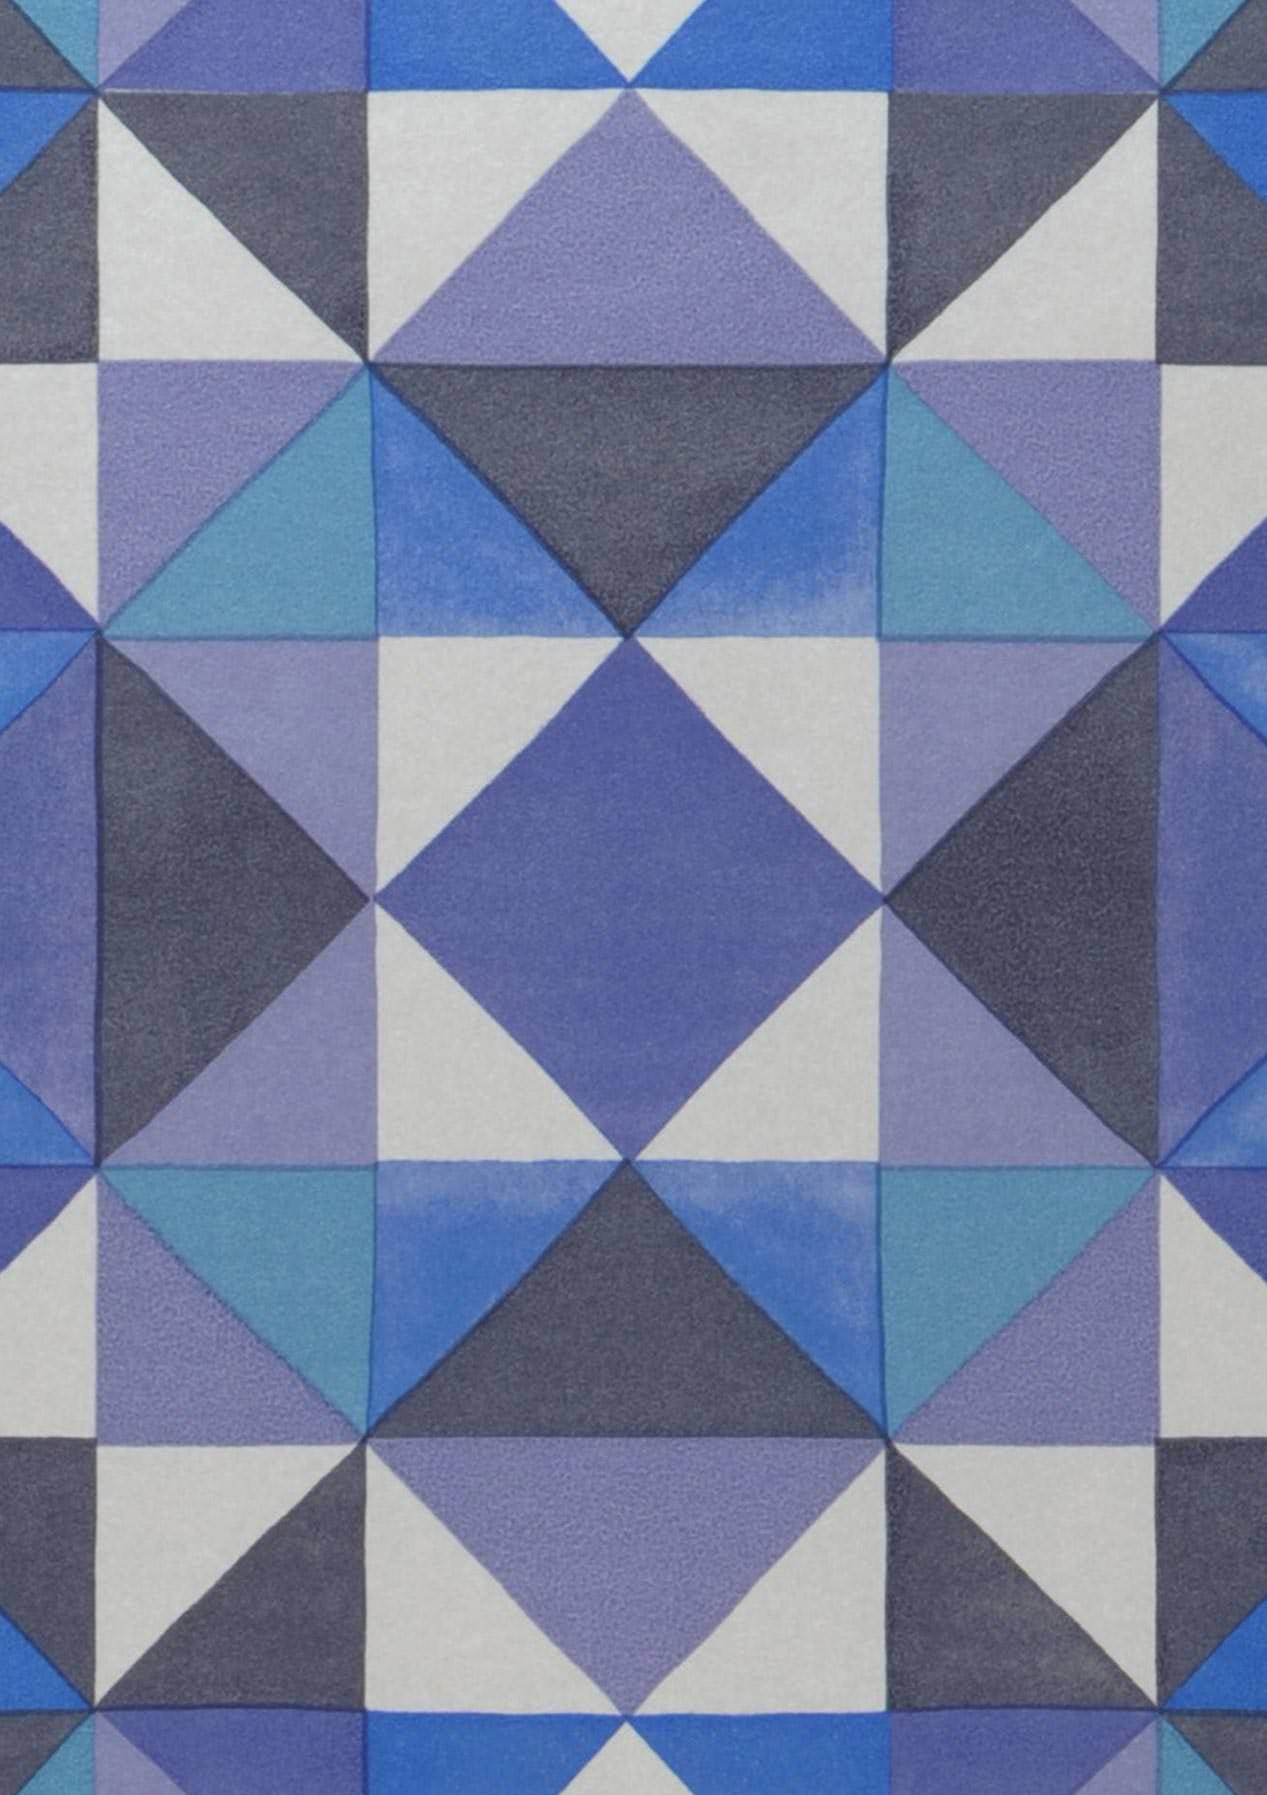 tapete sirius blau cremeweiss perlbrombeer schwarzblau